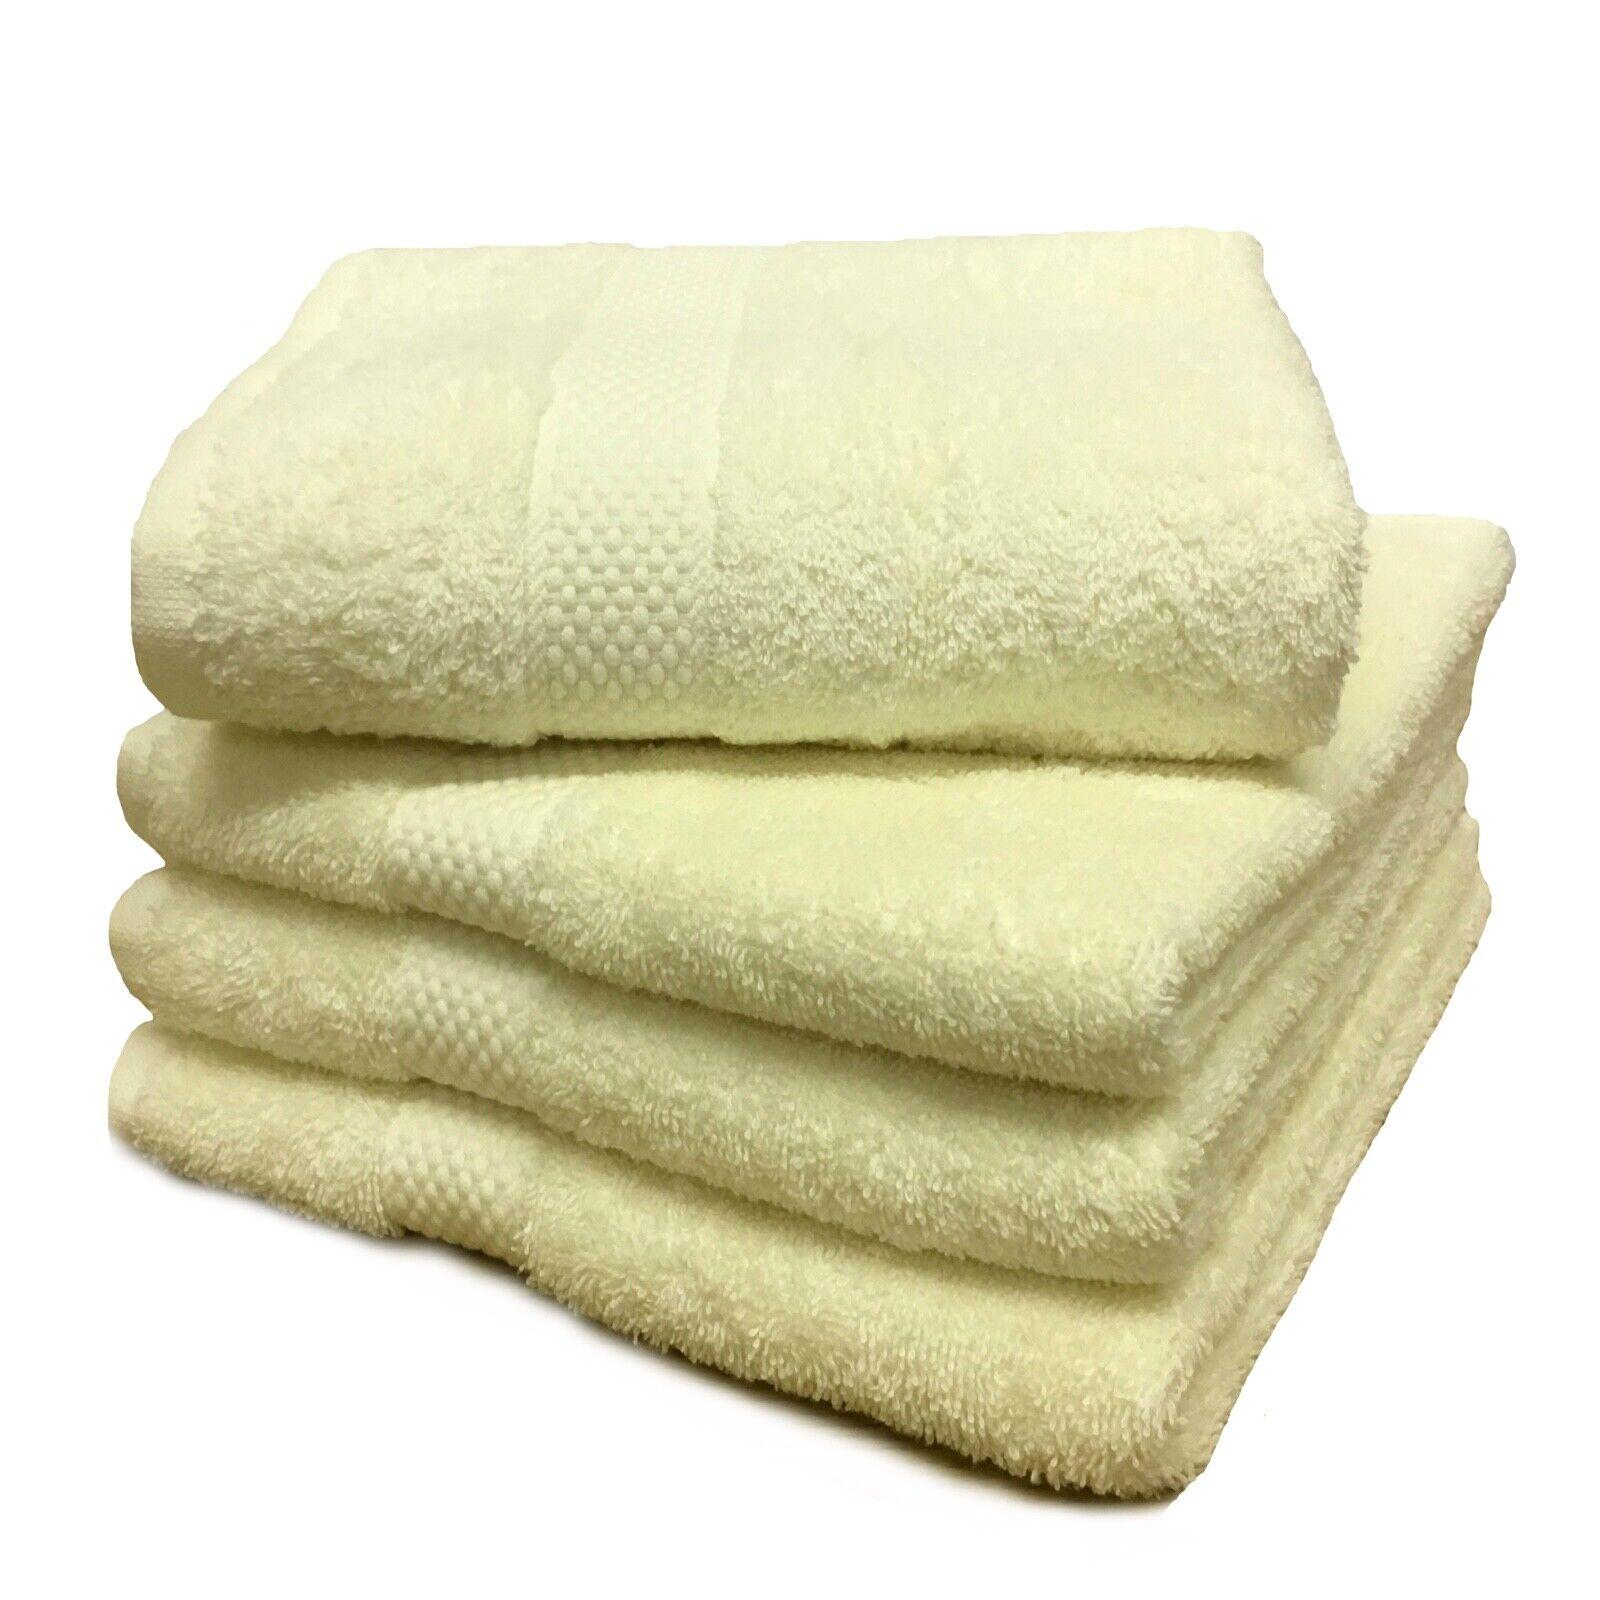 Luxury 100/% combed cotton super soft towels face hand bath towel sheet bathroom